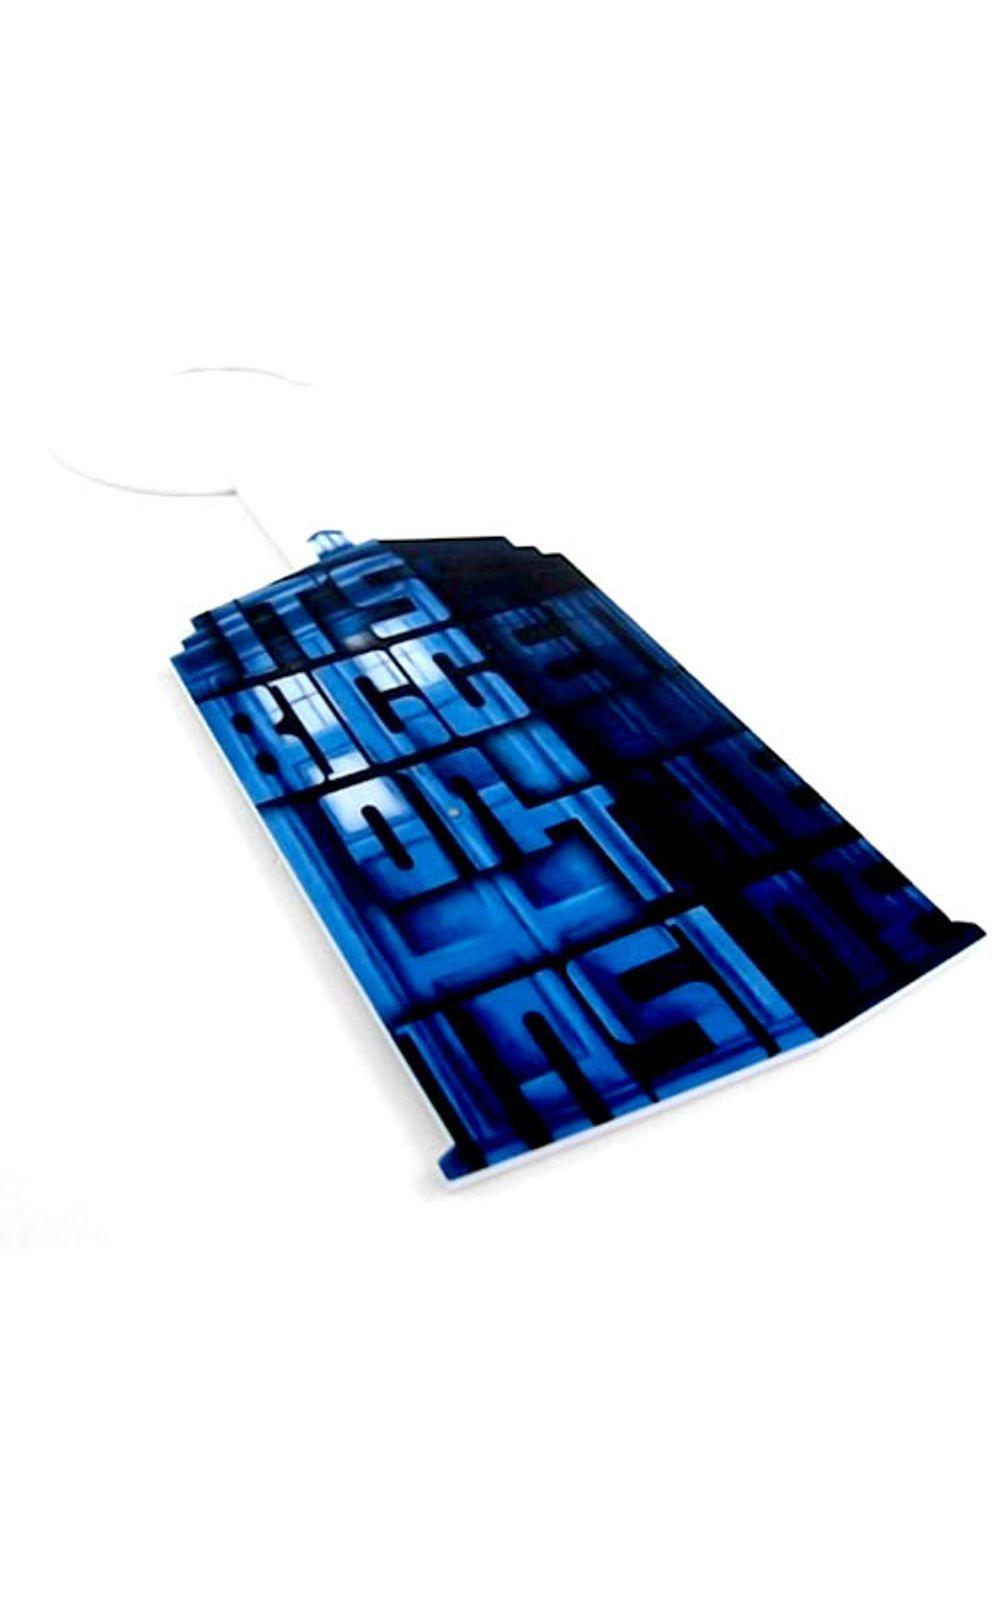 Foto 2 - Aviso de Porta Cabine Doctor Who